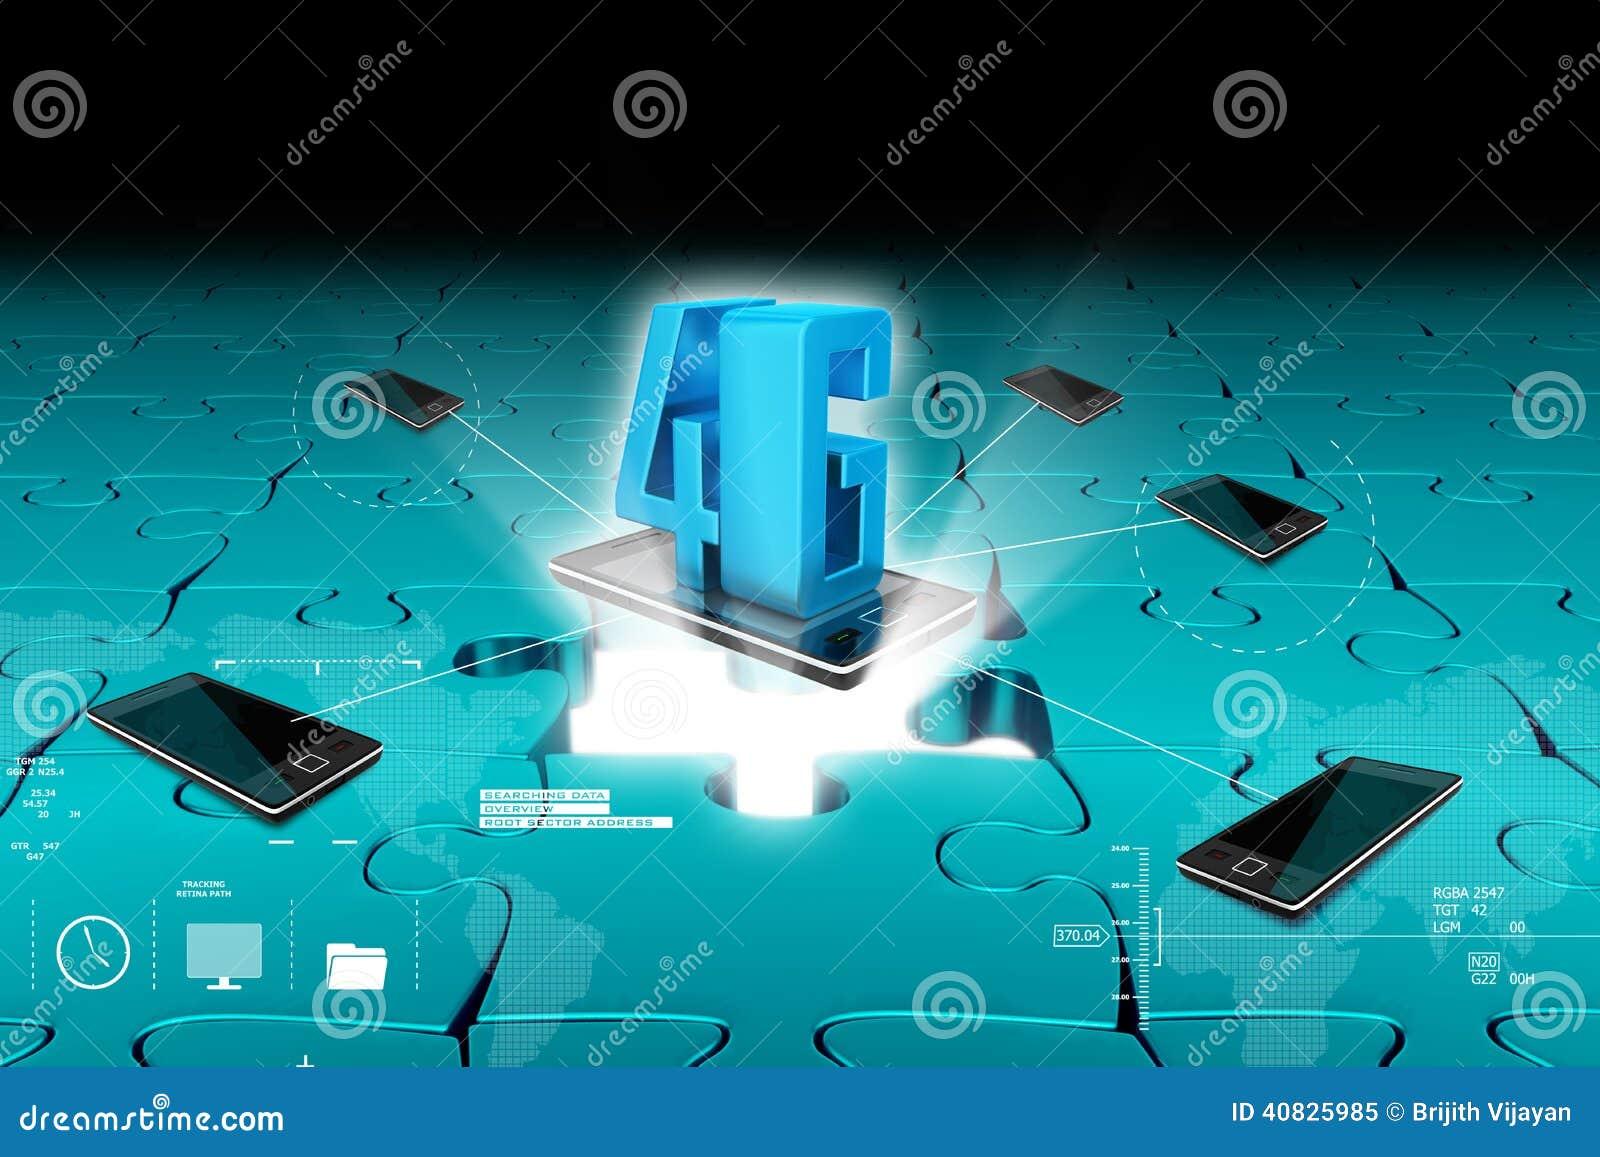 Concept Of 4g Technology Stock Illustration  Illustration